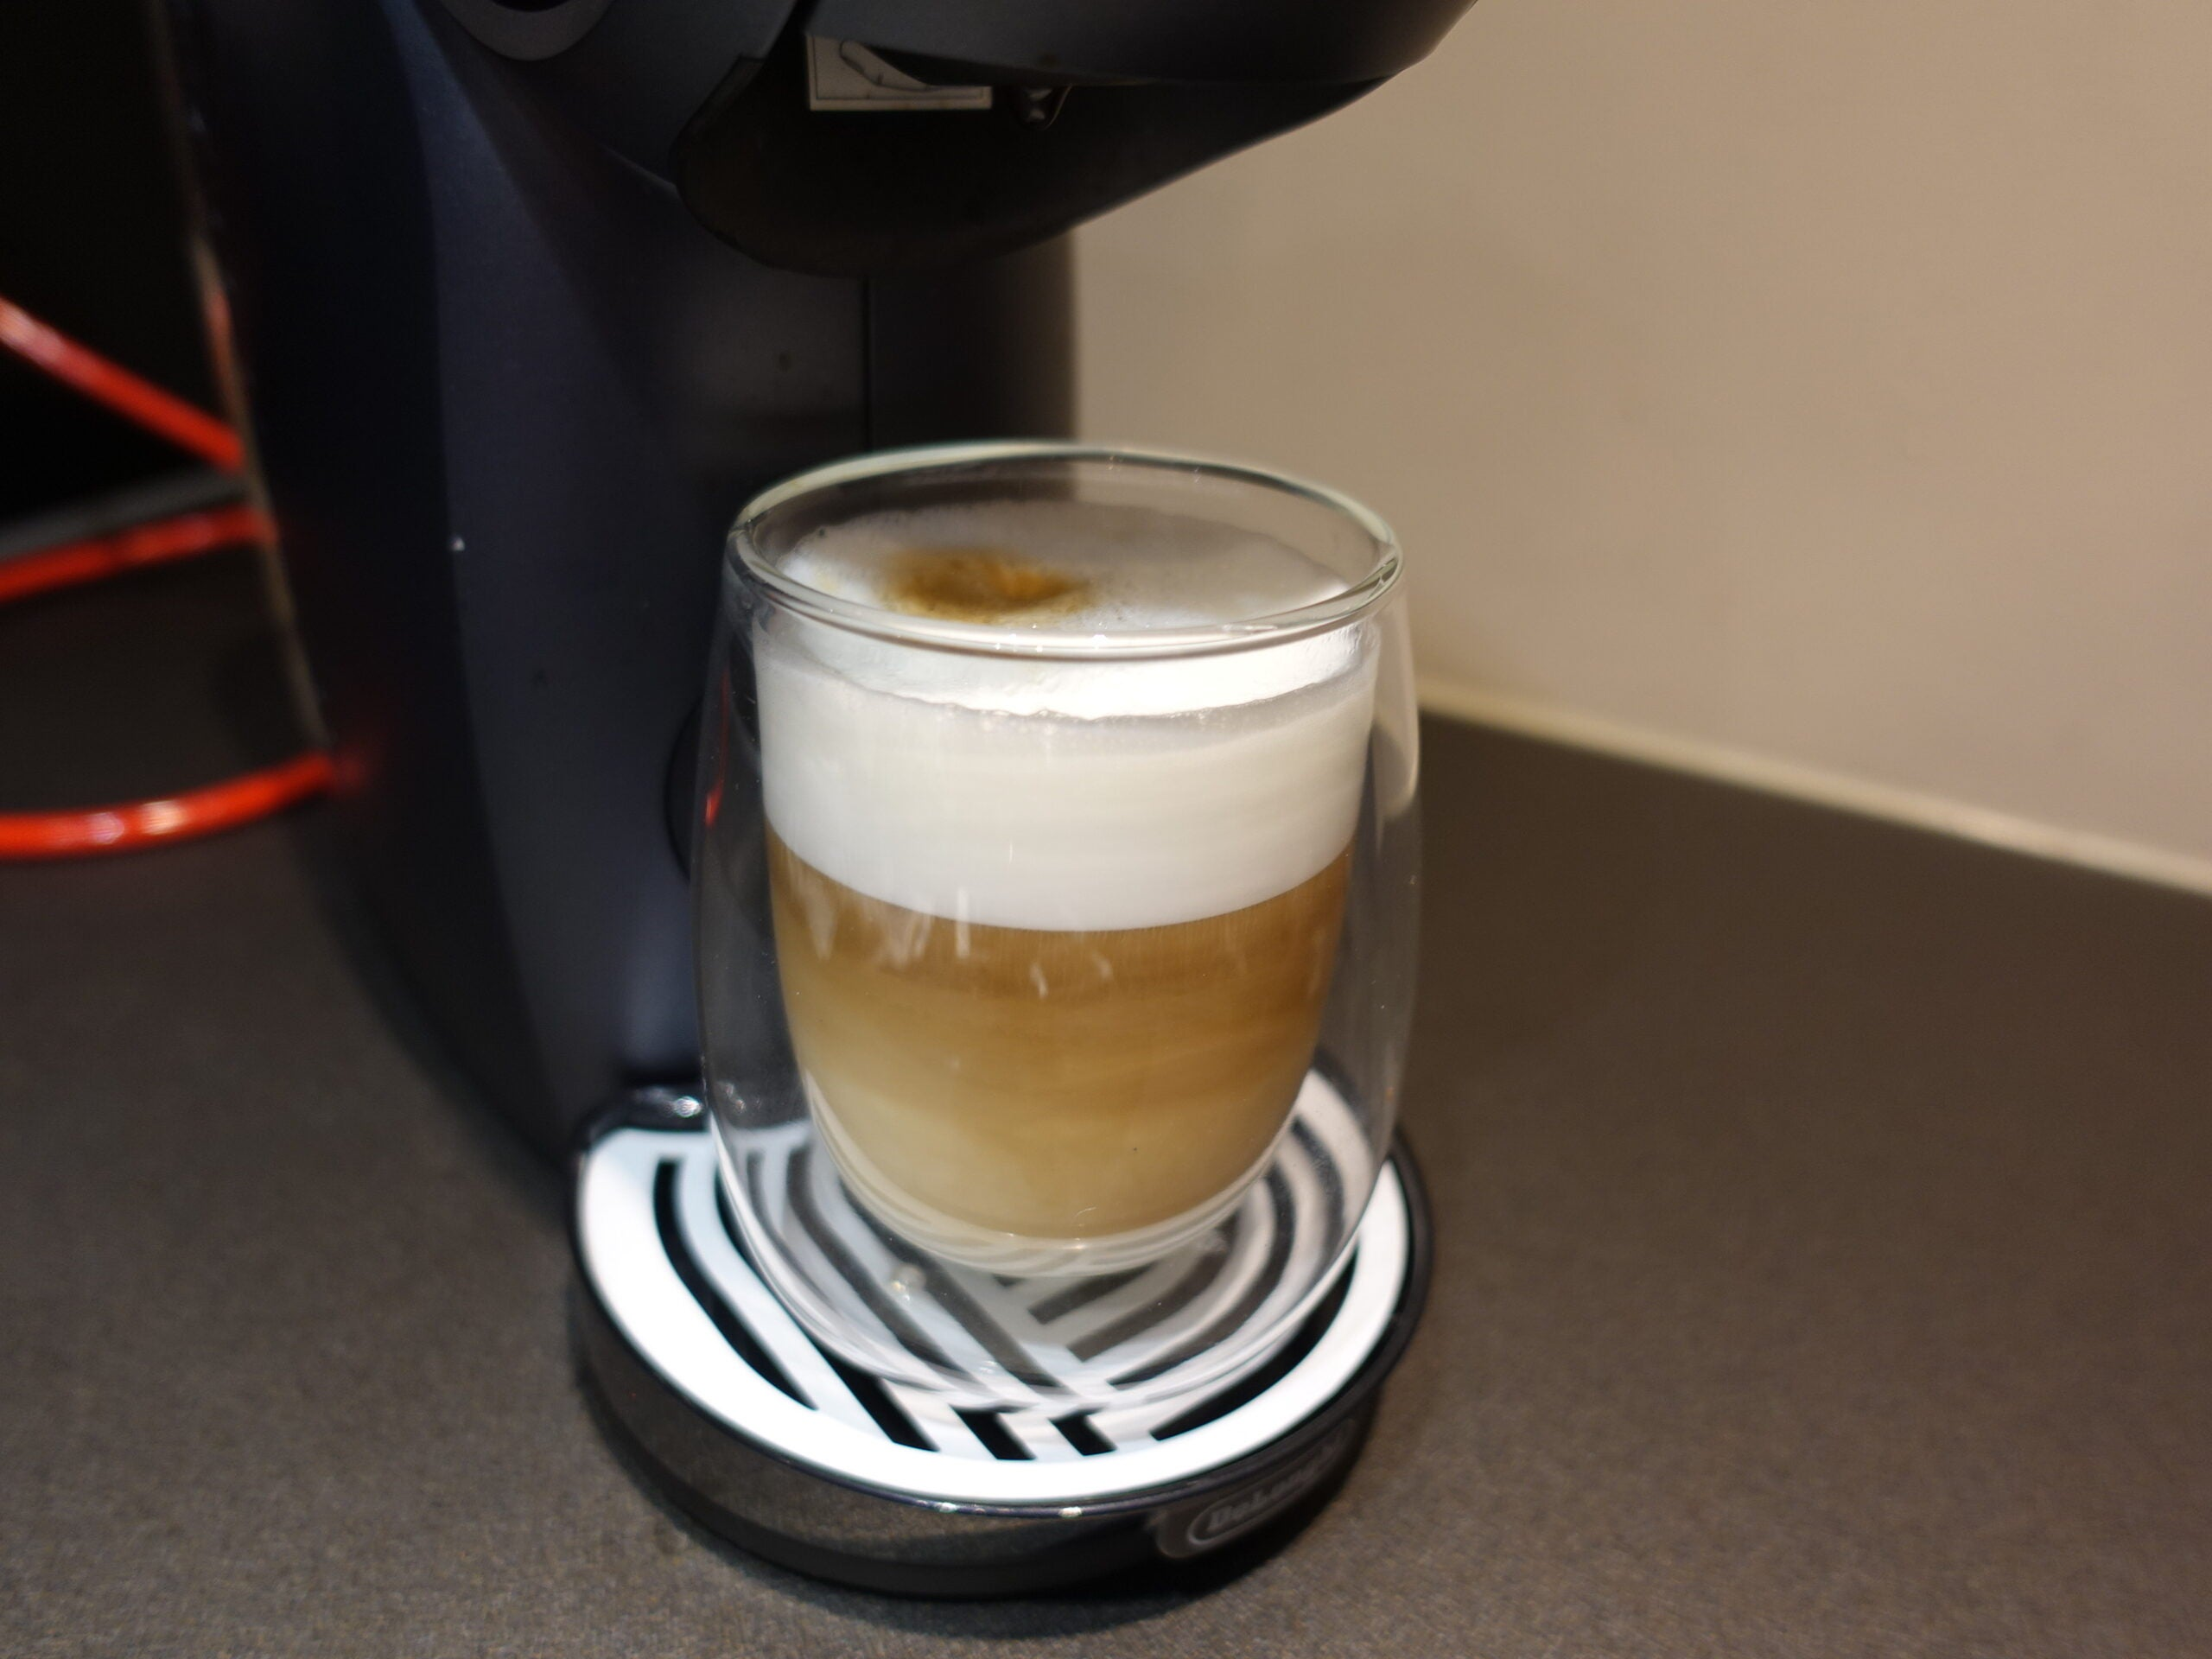 De'Longhi Nescafé Dolce Gusto Genio S Touch milk